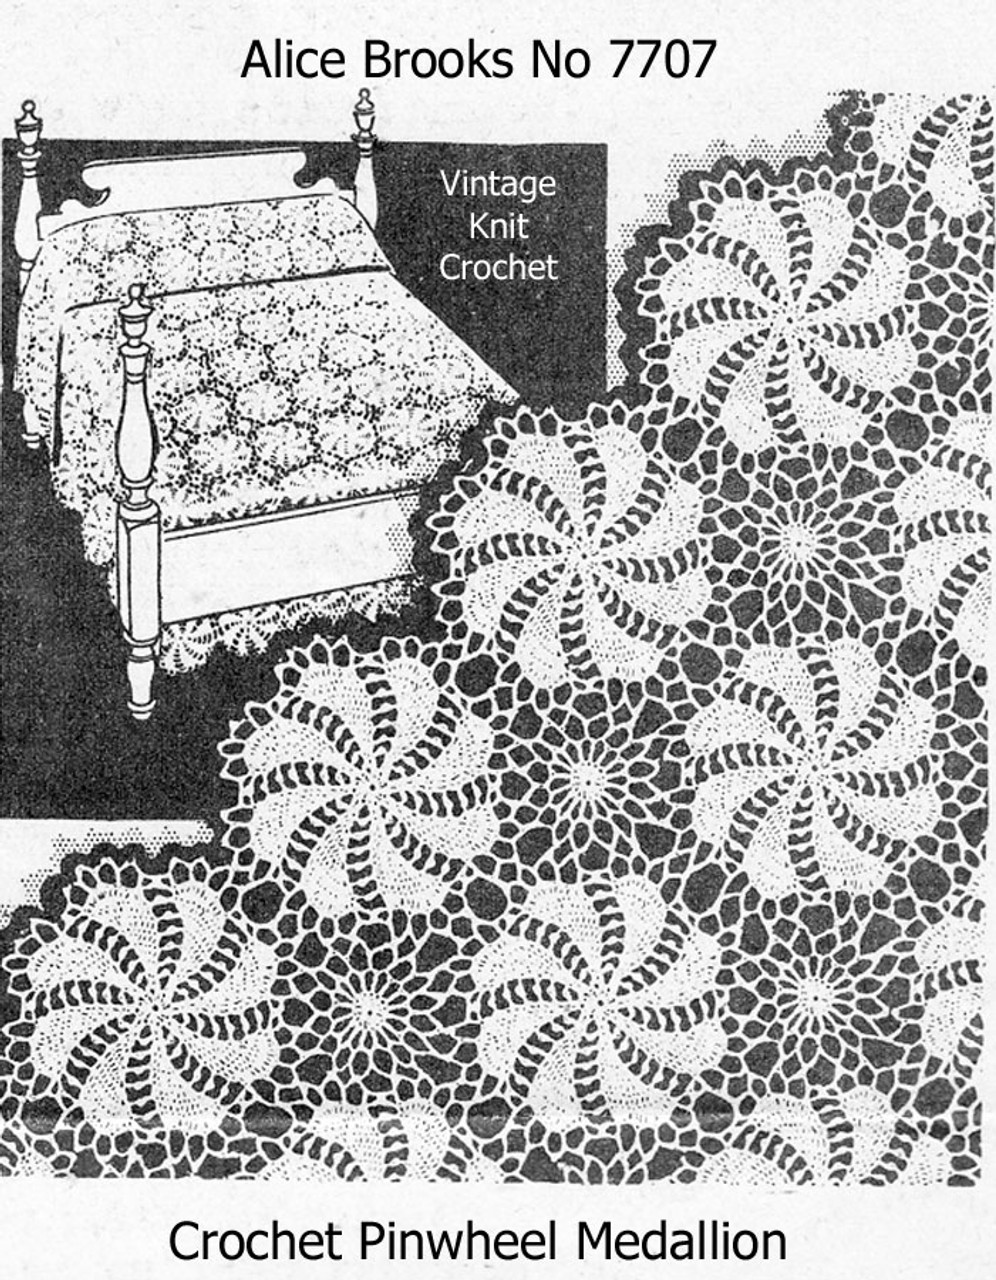 Crochet Bedspread Pattern, pinwheel medallions No 7707